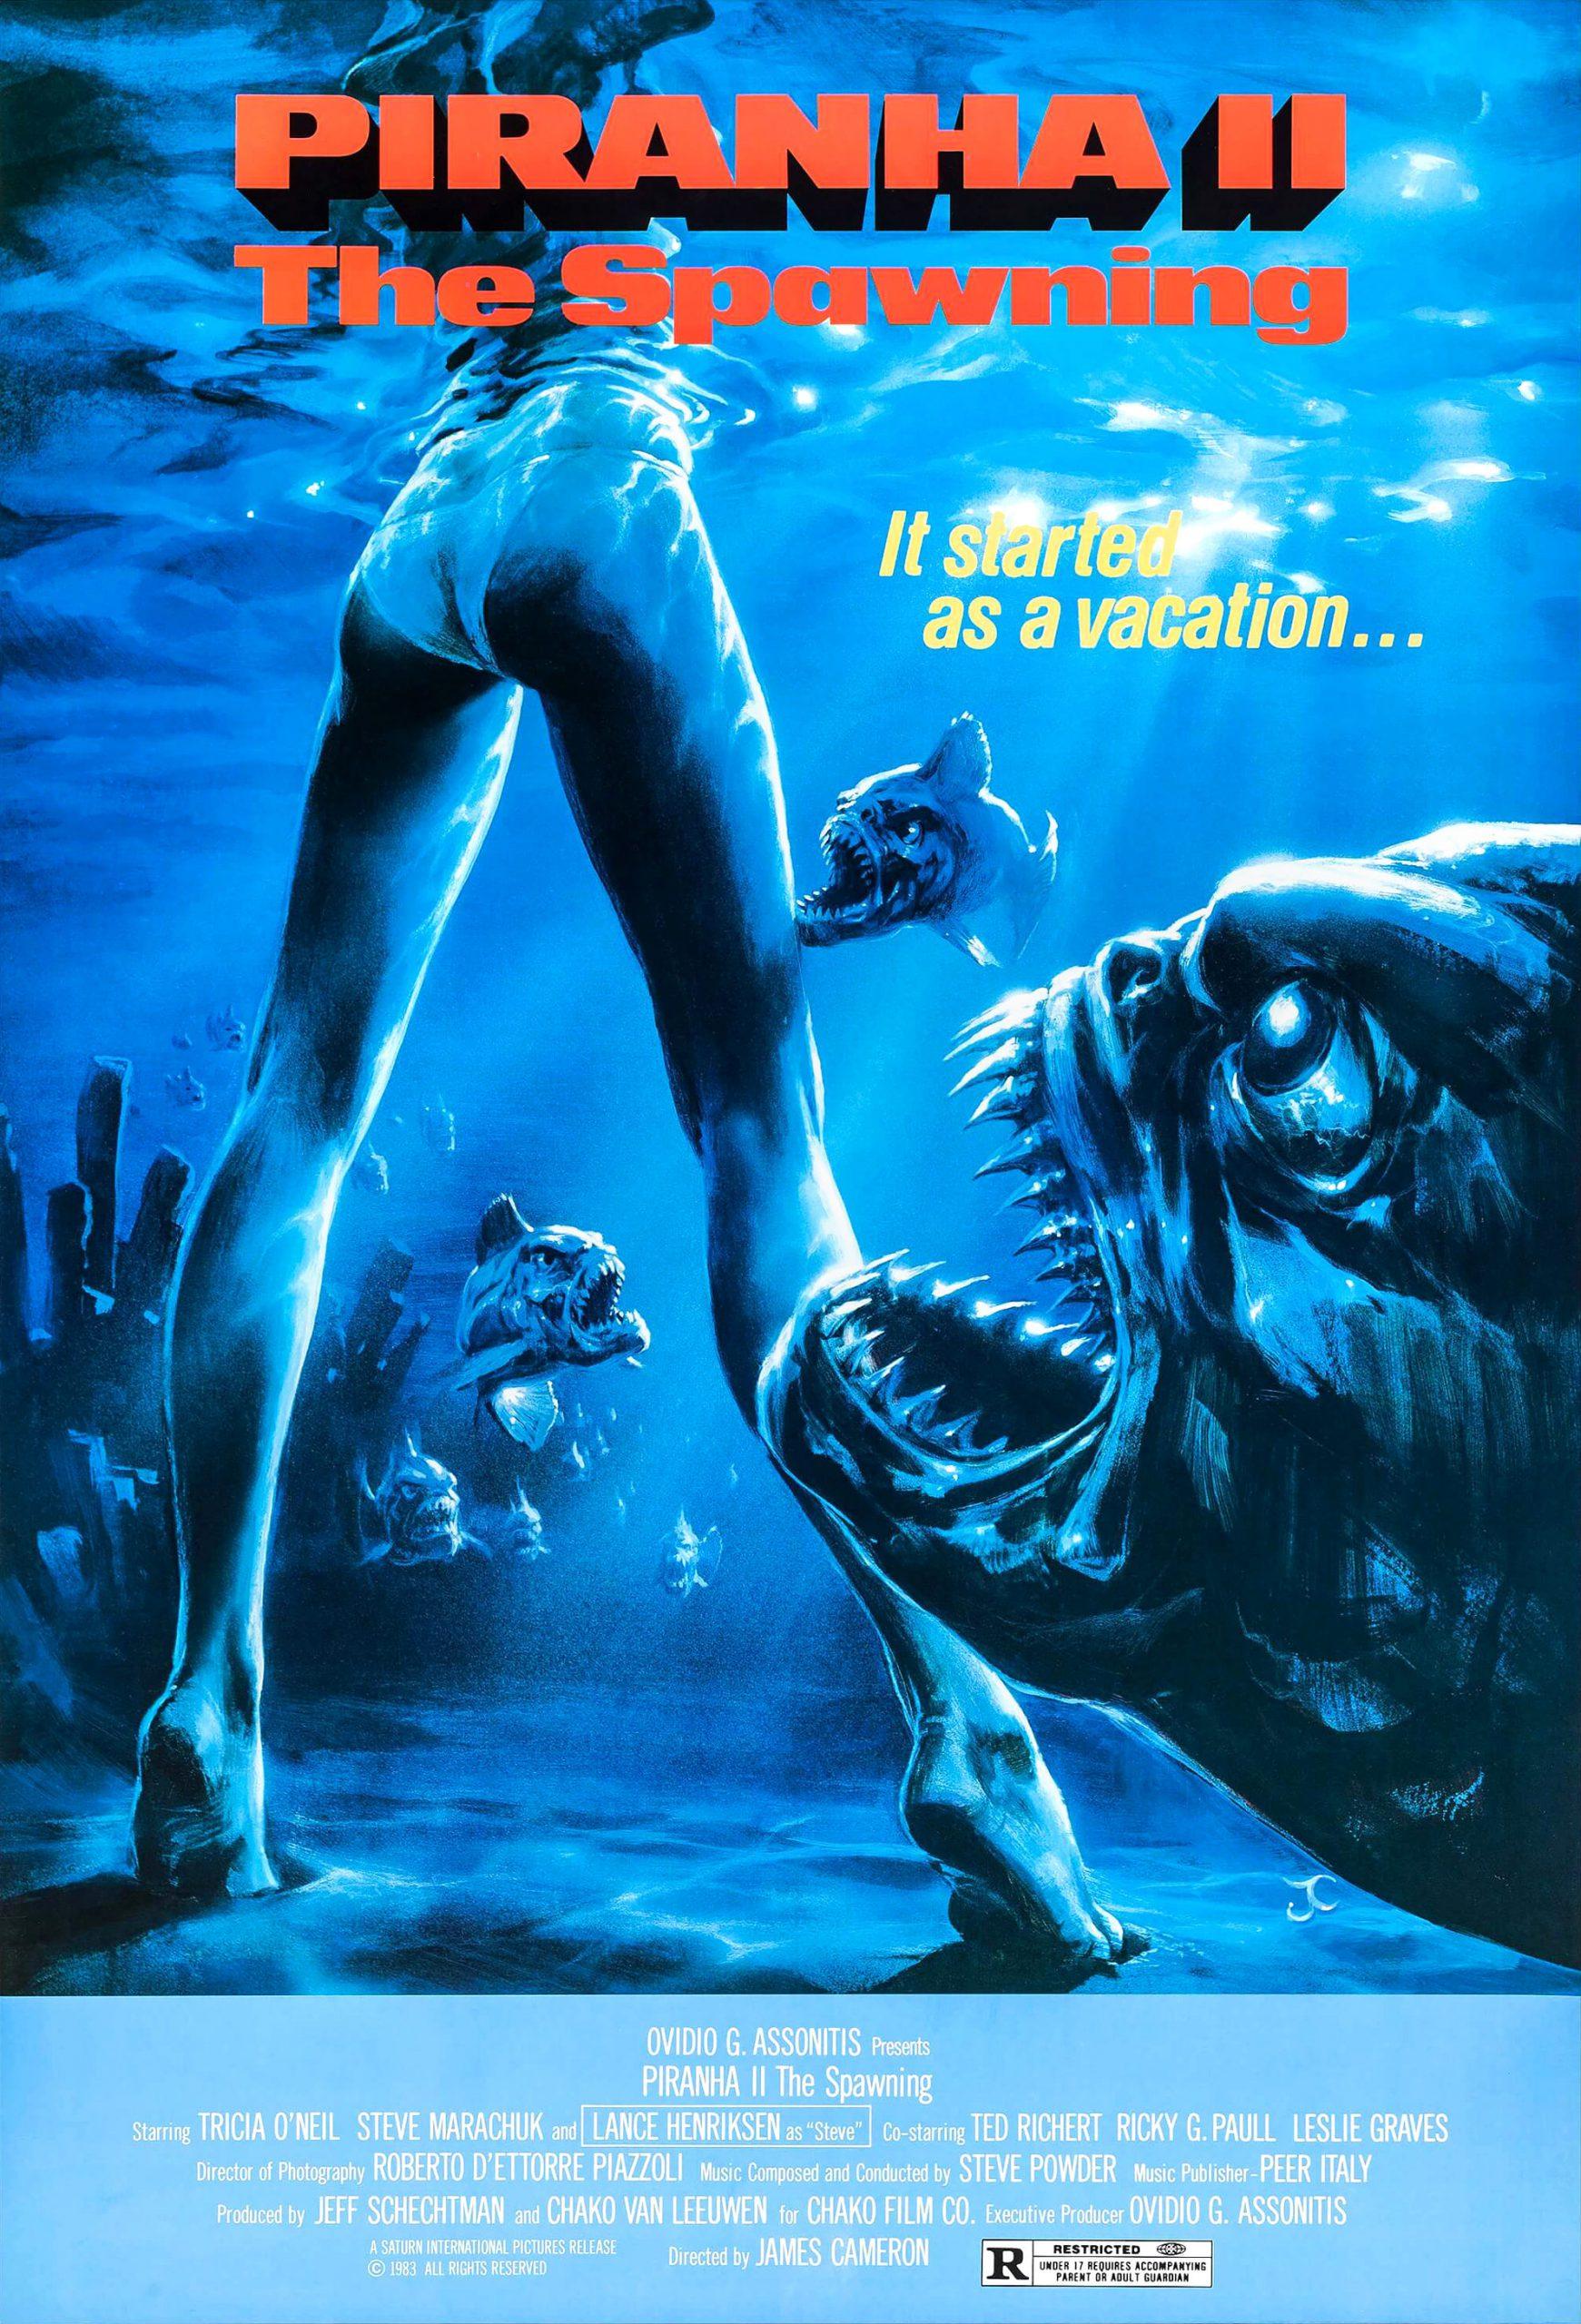 Piranha Spawning (1982)